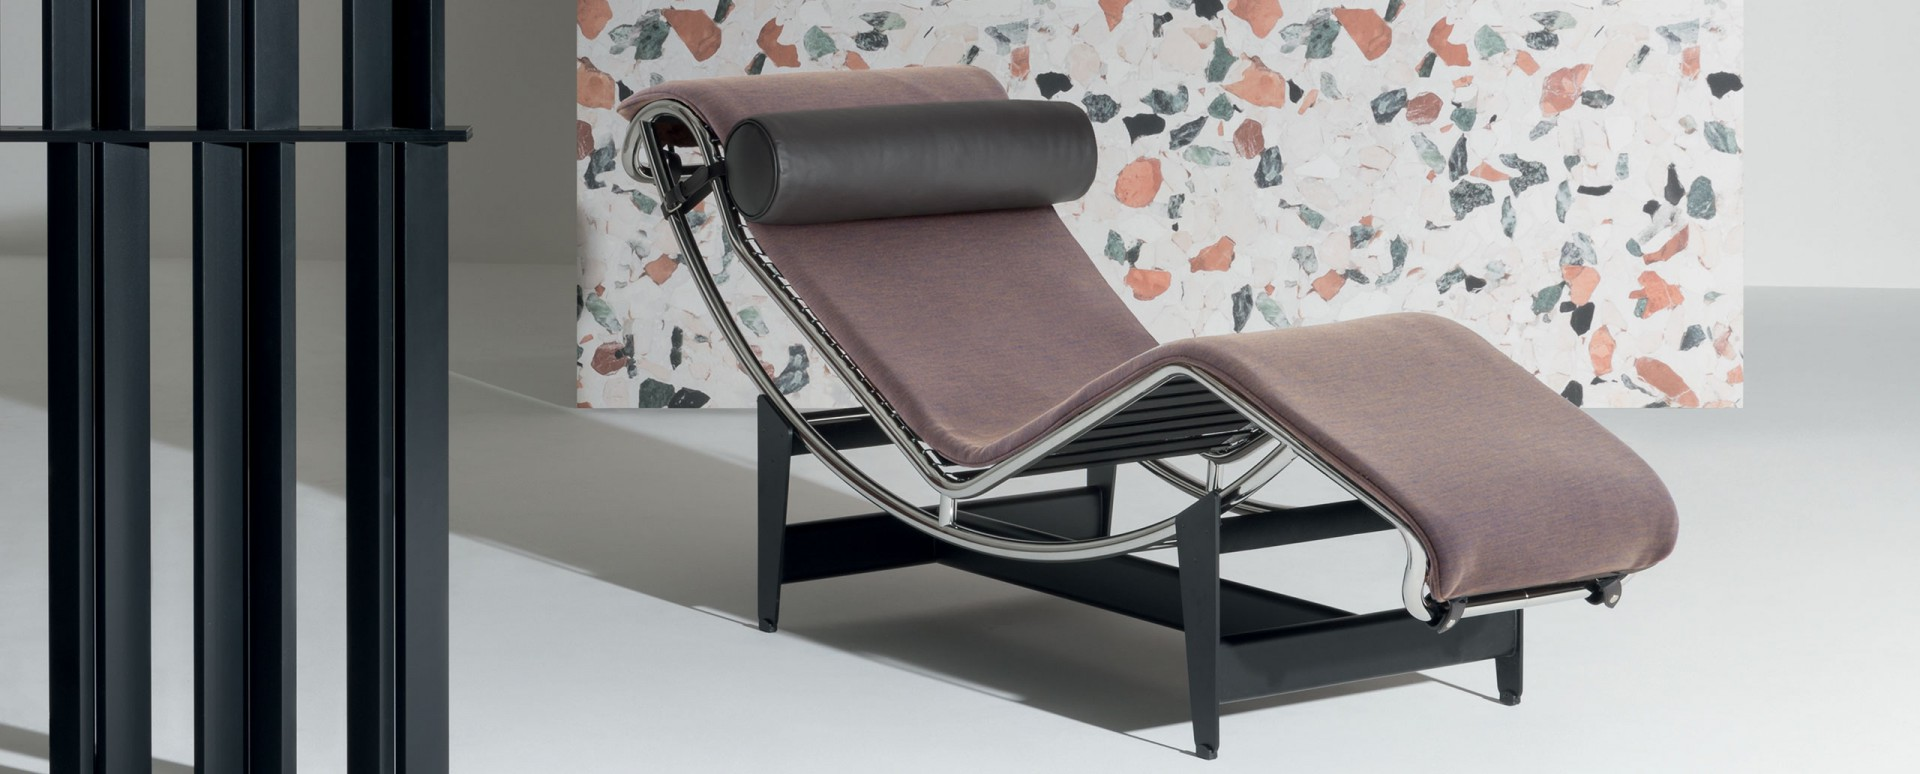 Szezlong LC4 firmy Cassina. Projekt: Le Corbusier. Fot. Cassina